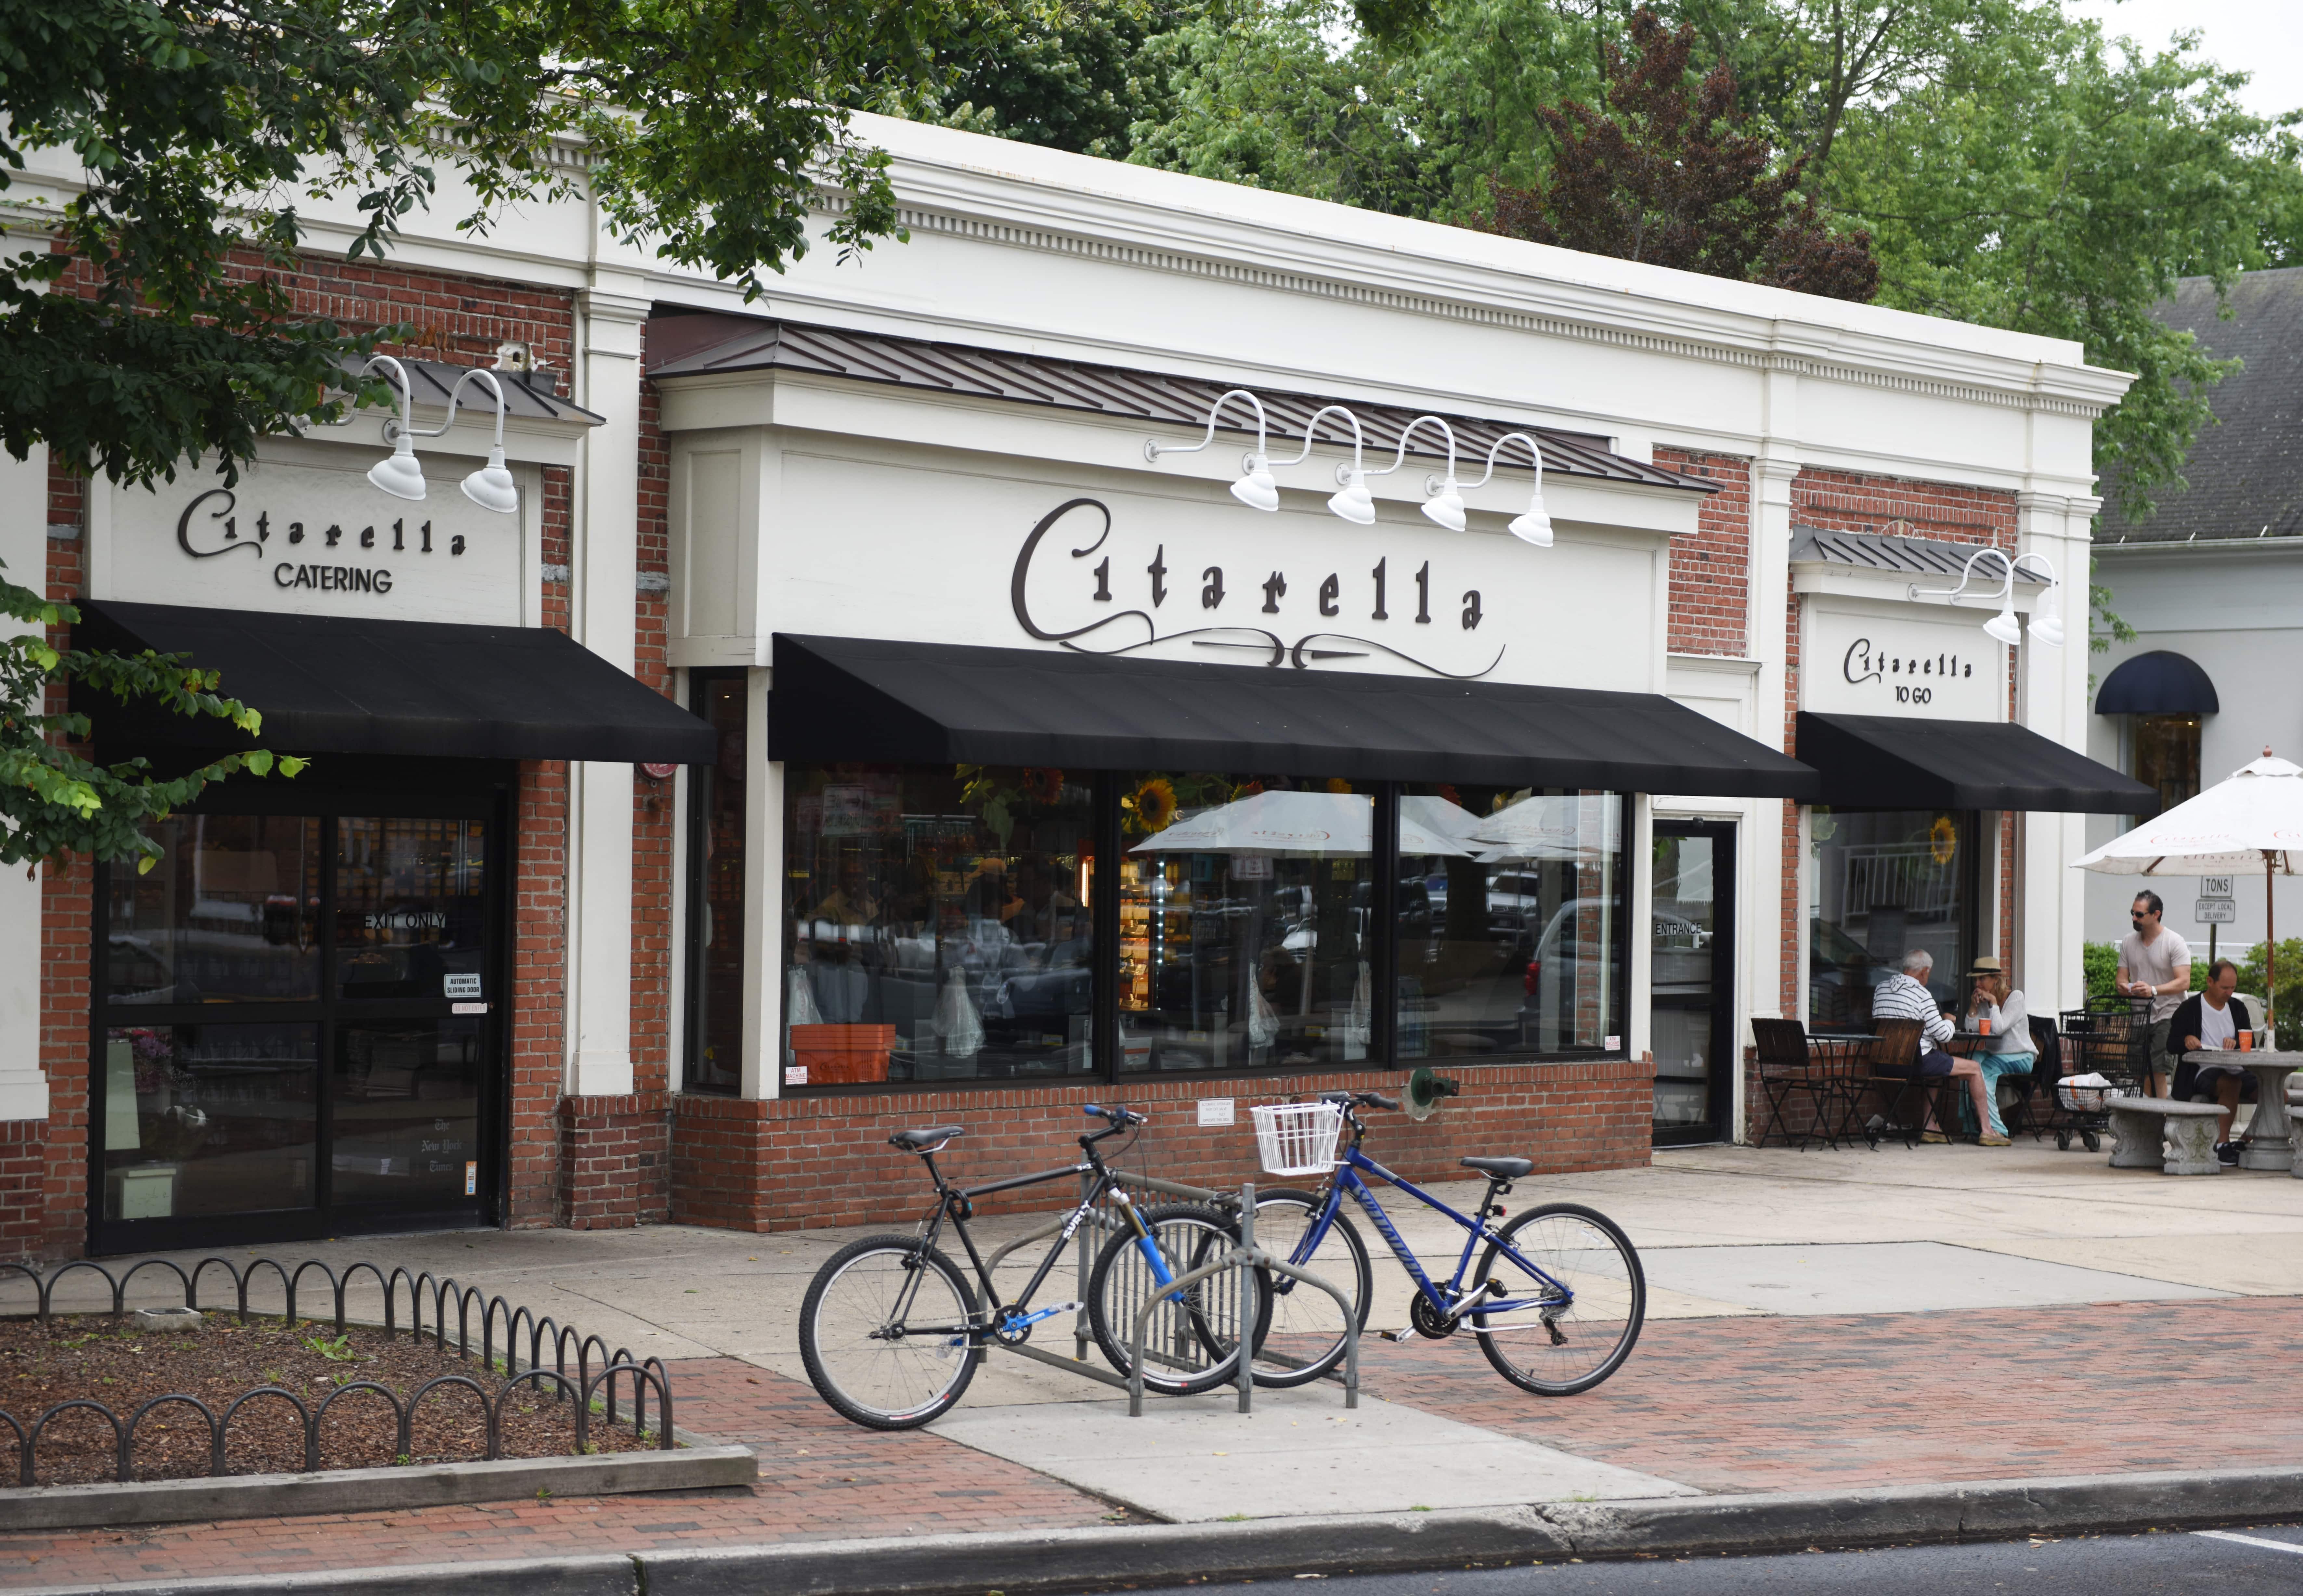 Citarella Gourmet Market - East Hampton image 0